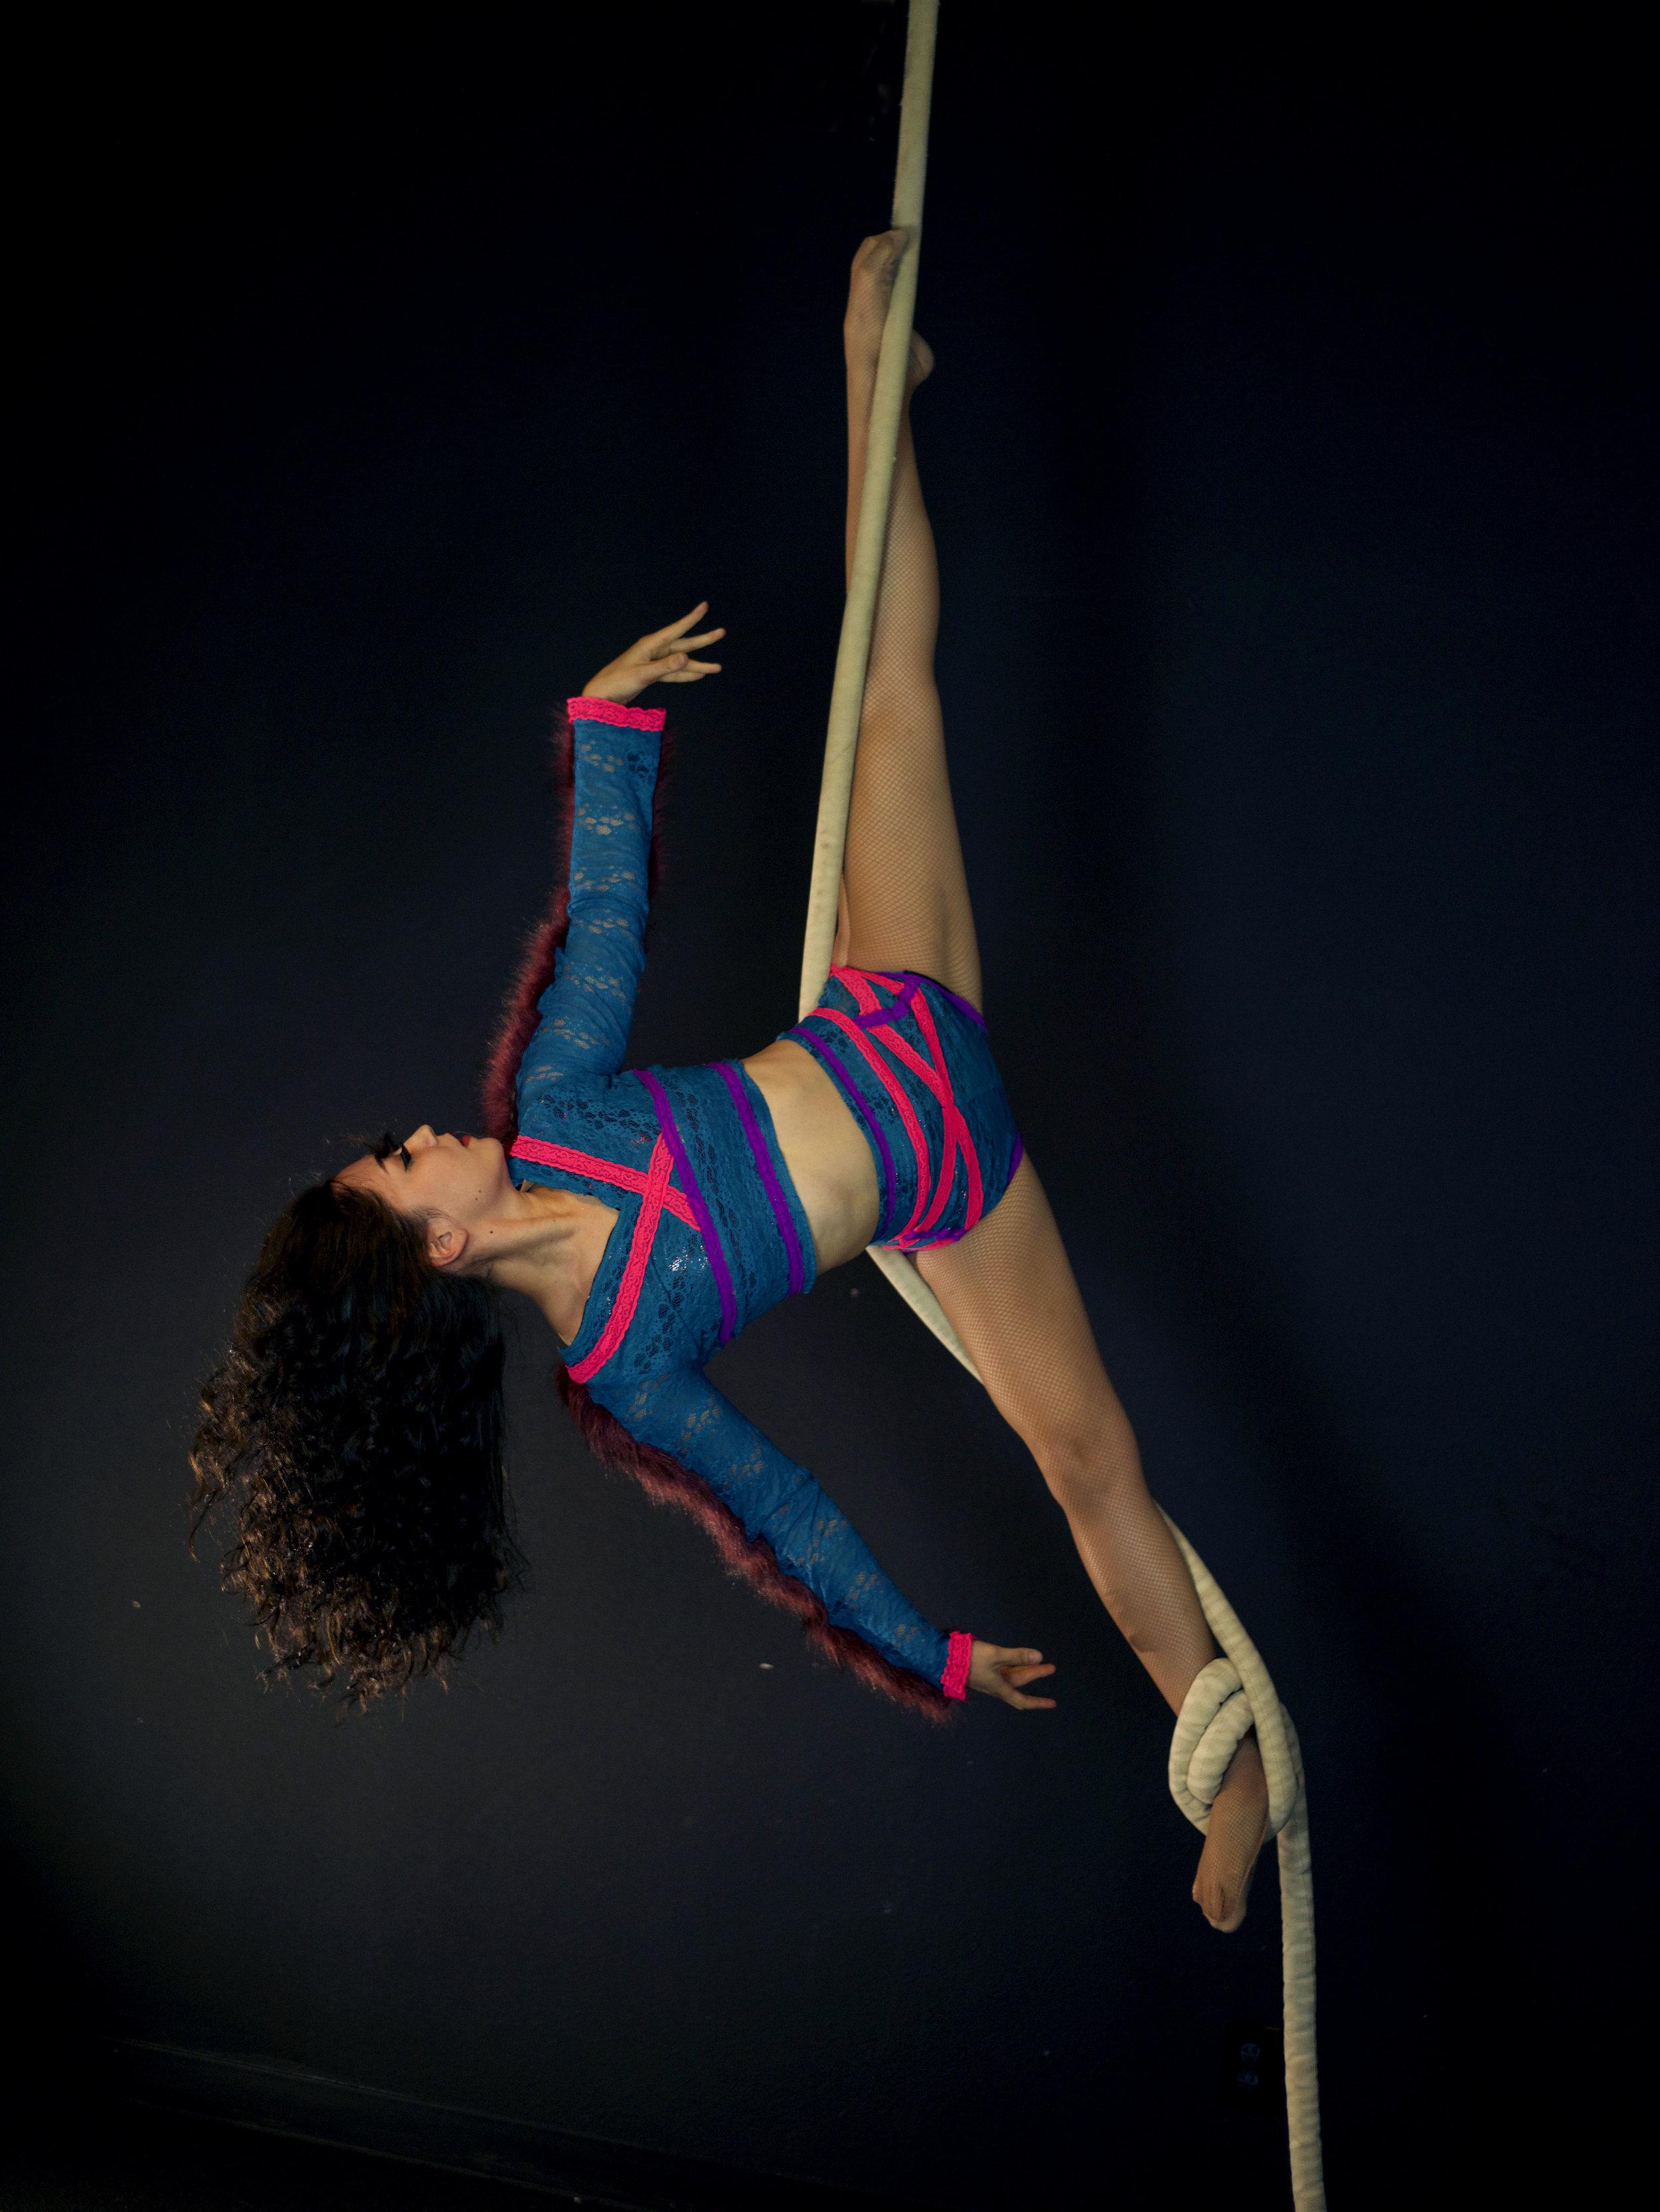 Wrara Plesoiu Aerial Rope splits pose